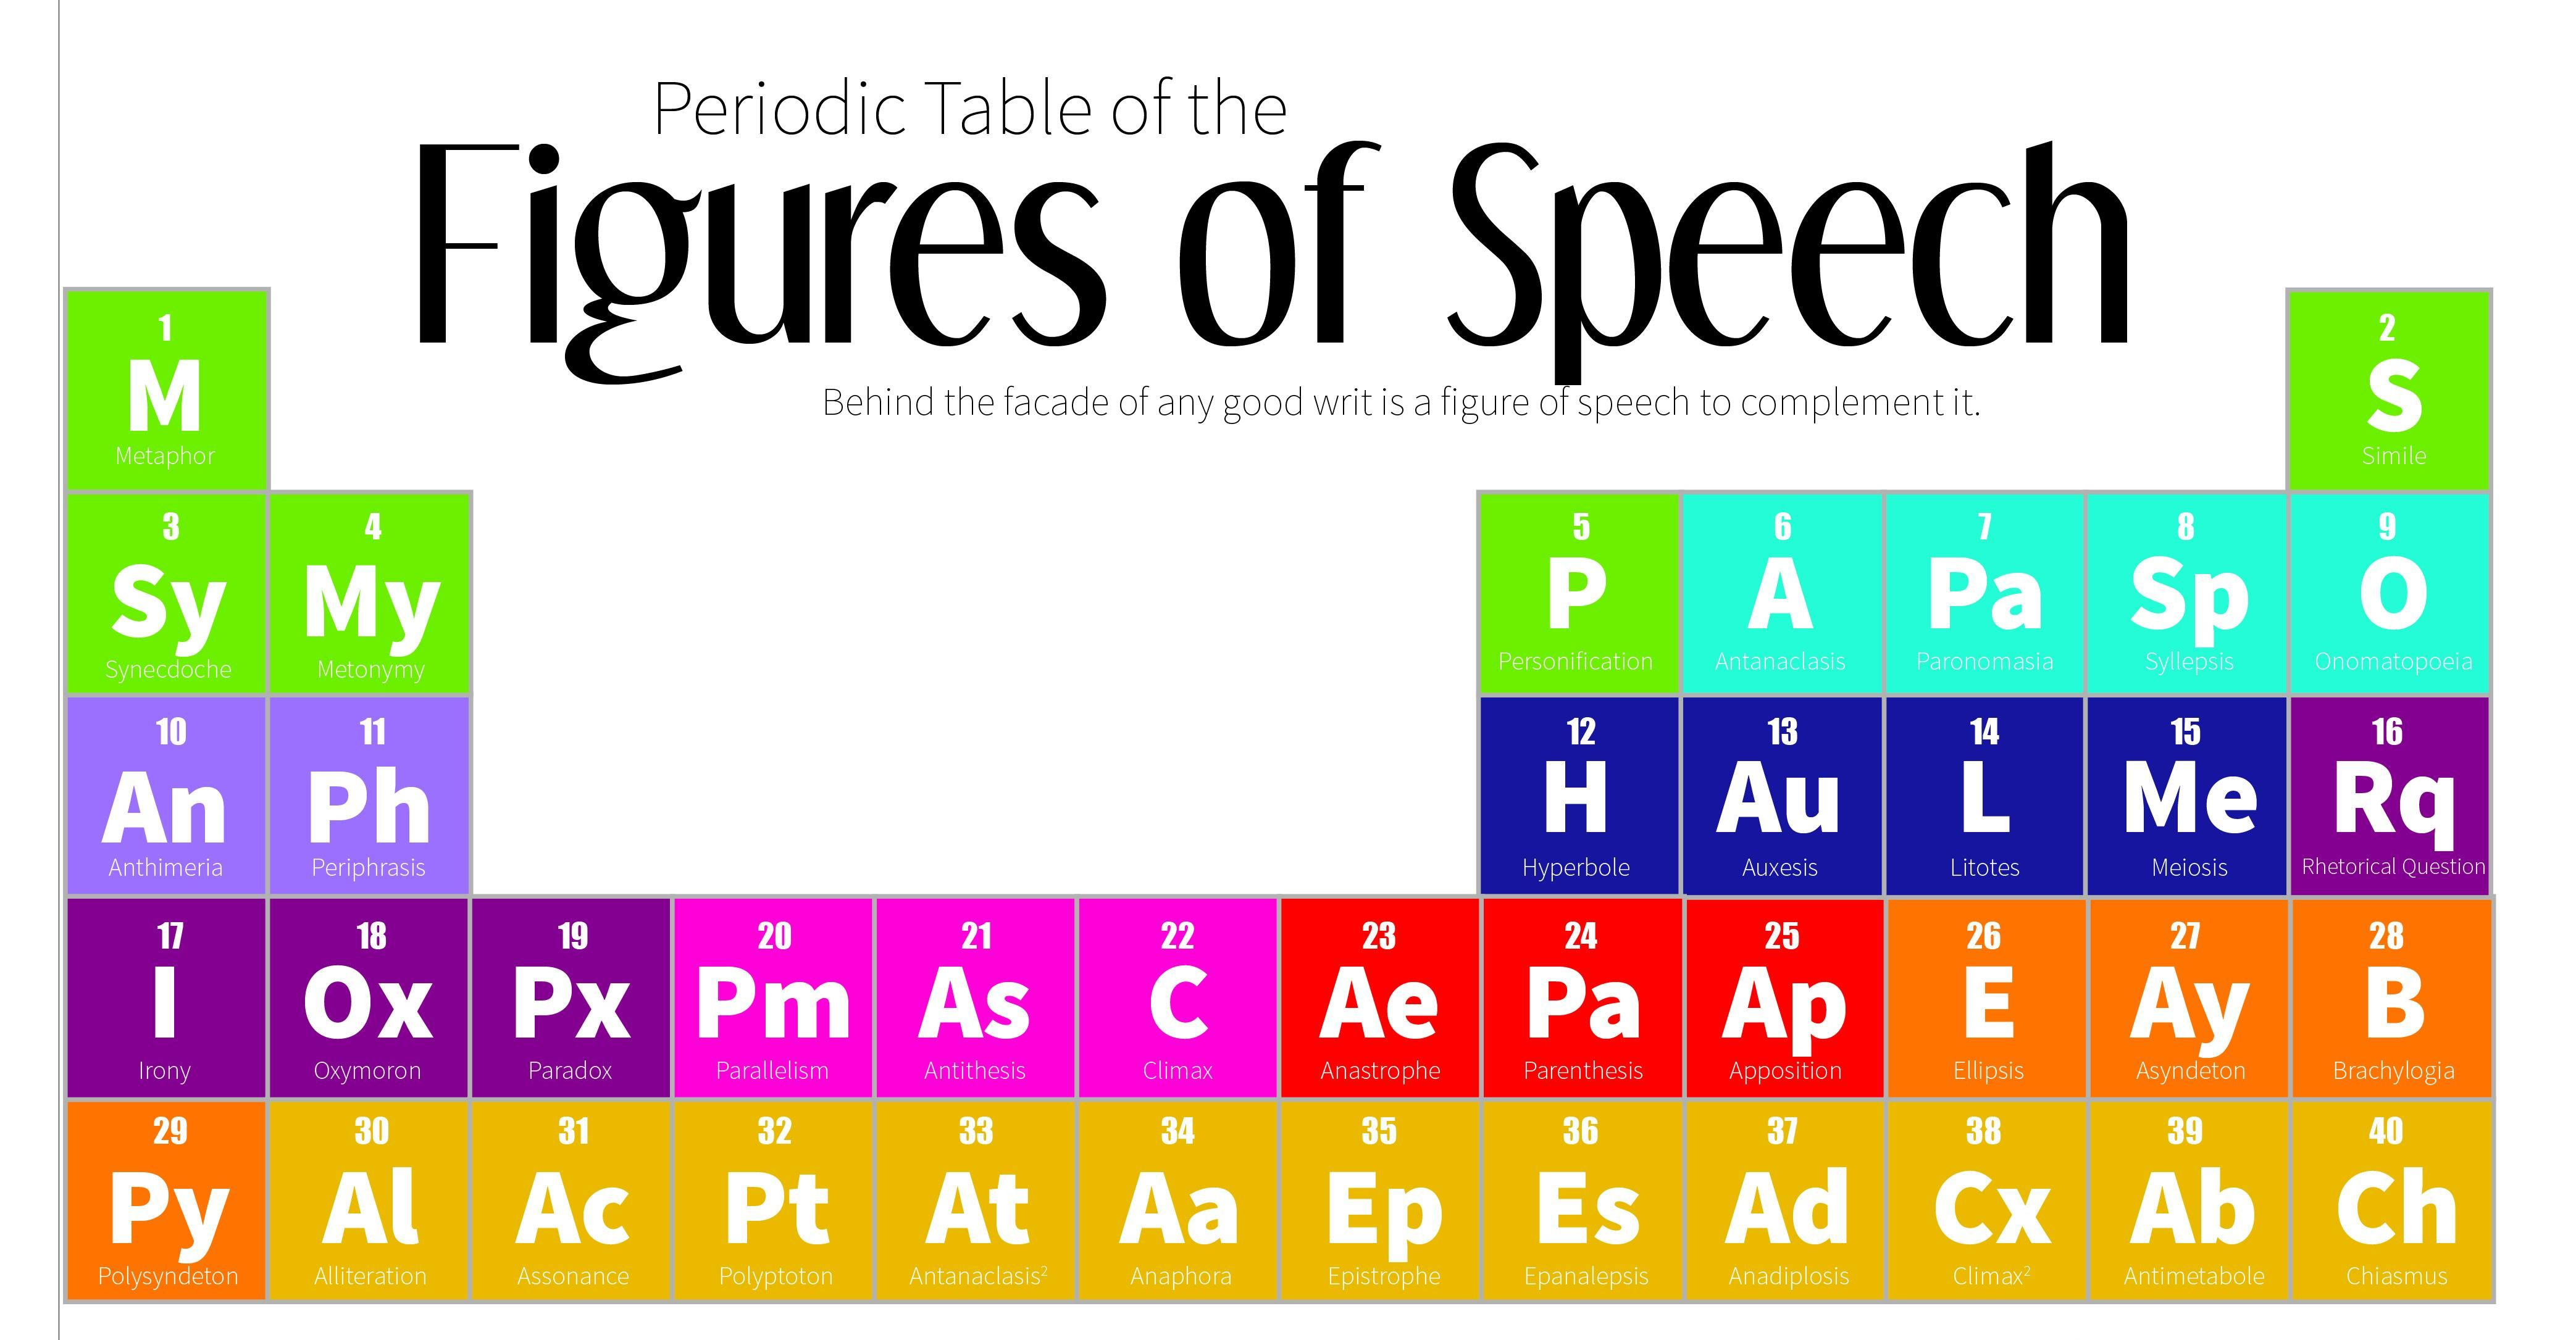 Edmodo spotlight periodic table of figures of speech edmodo edmodo spotlight periodic table of figures of speech urtaz Image collections